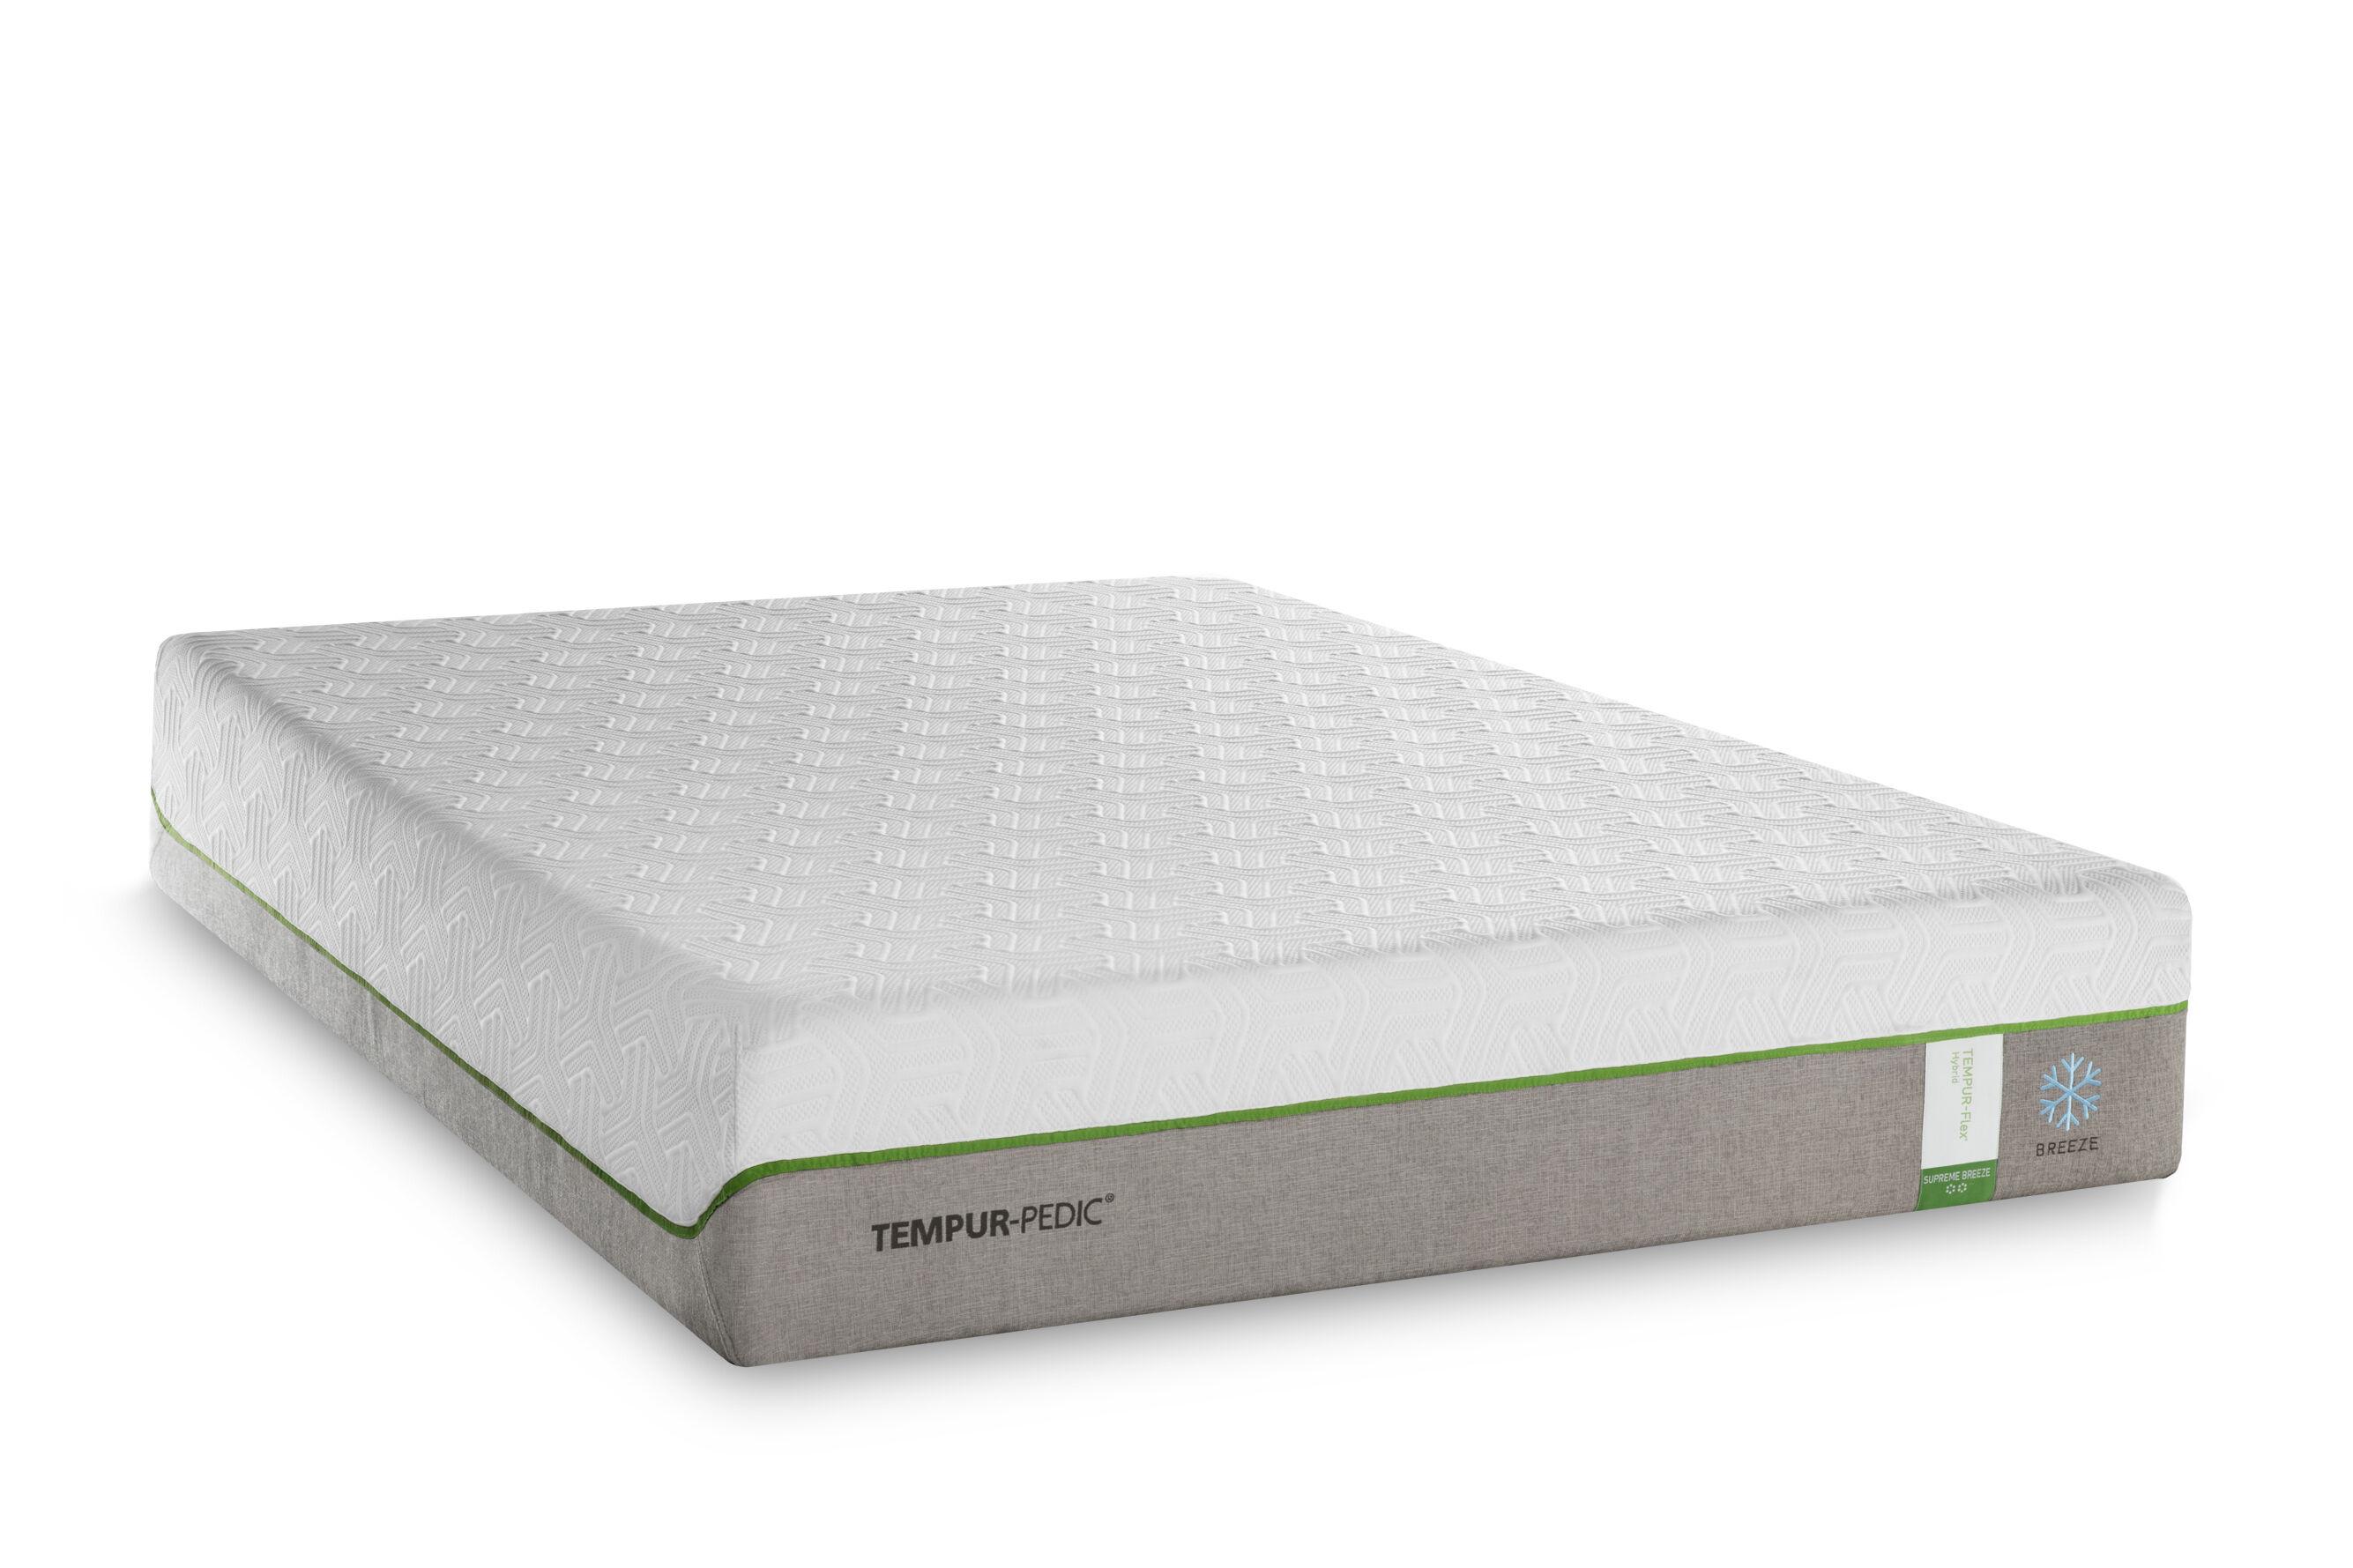 TempurPedic Hybrid Mattress  Mathis Brothers